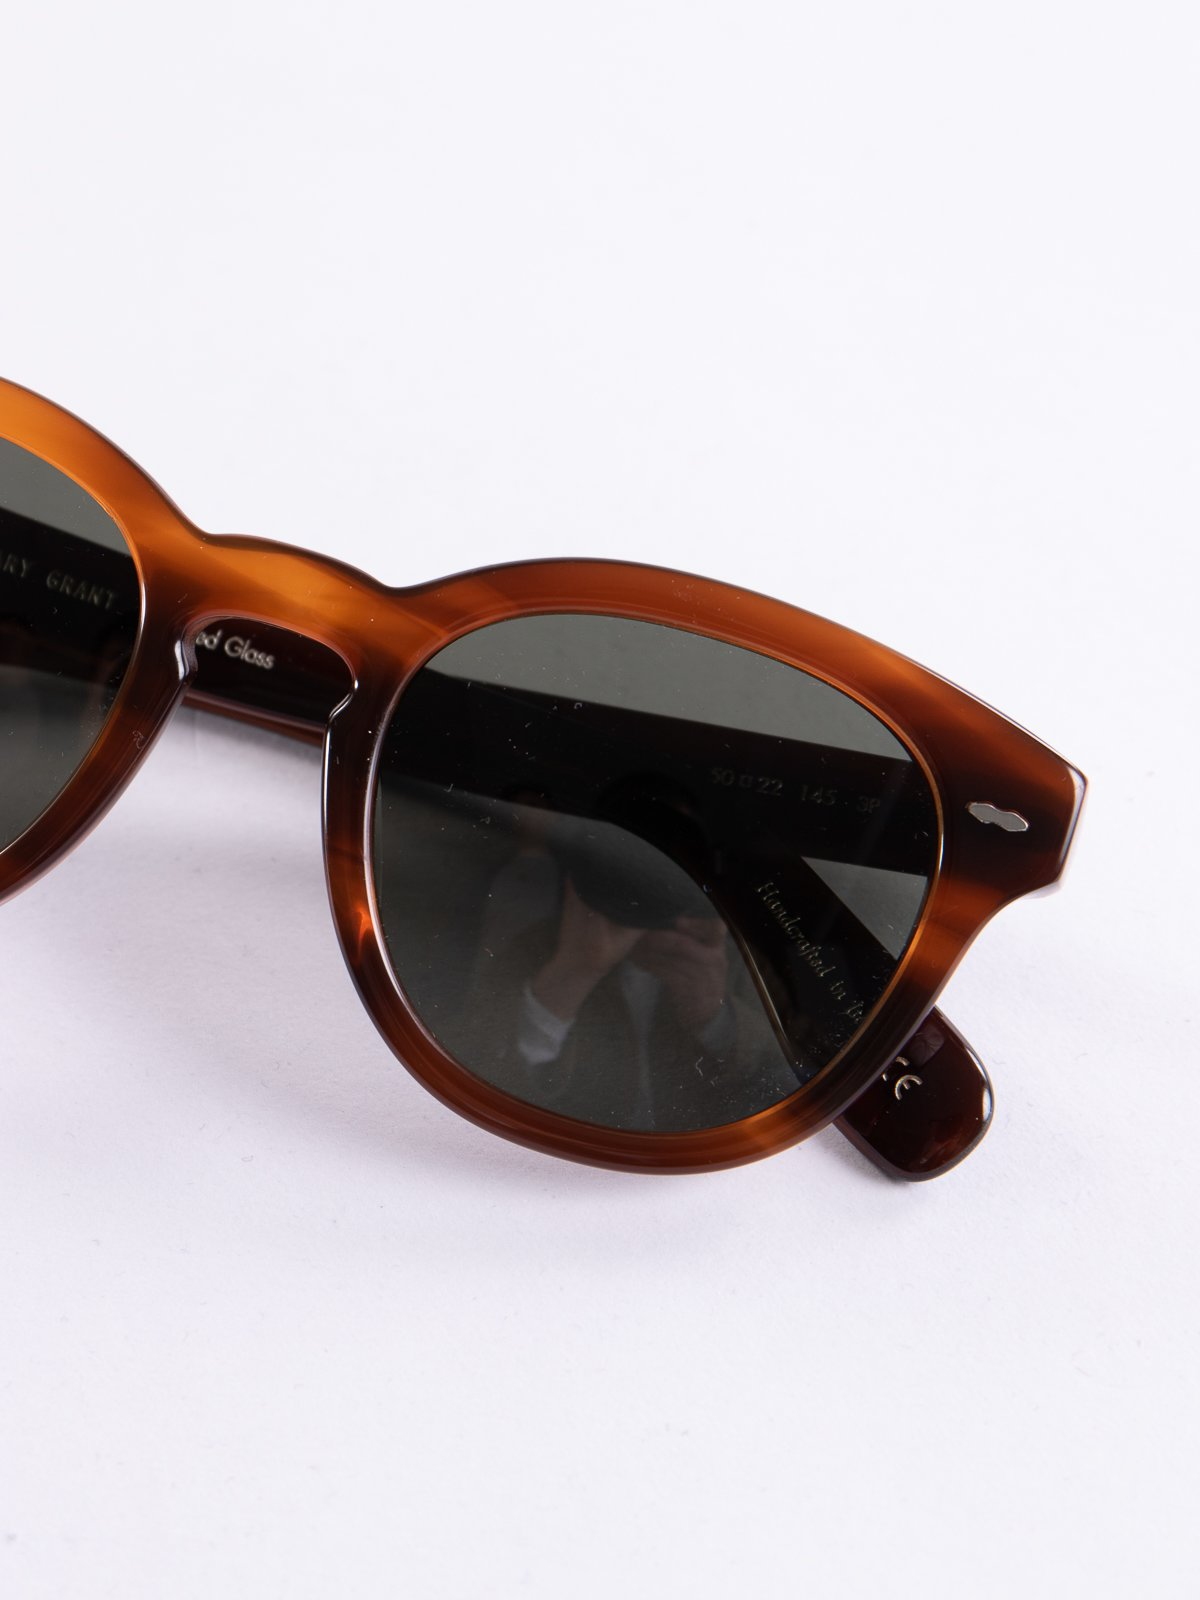 Grant Tortoise/G–15 Polar Cary Grant Sunglasses - Image 2